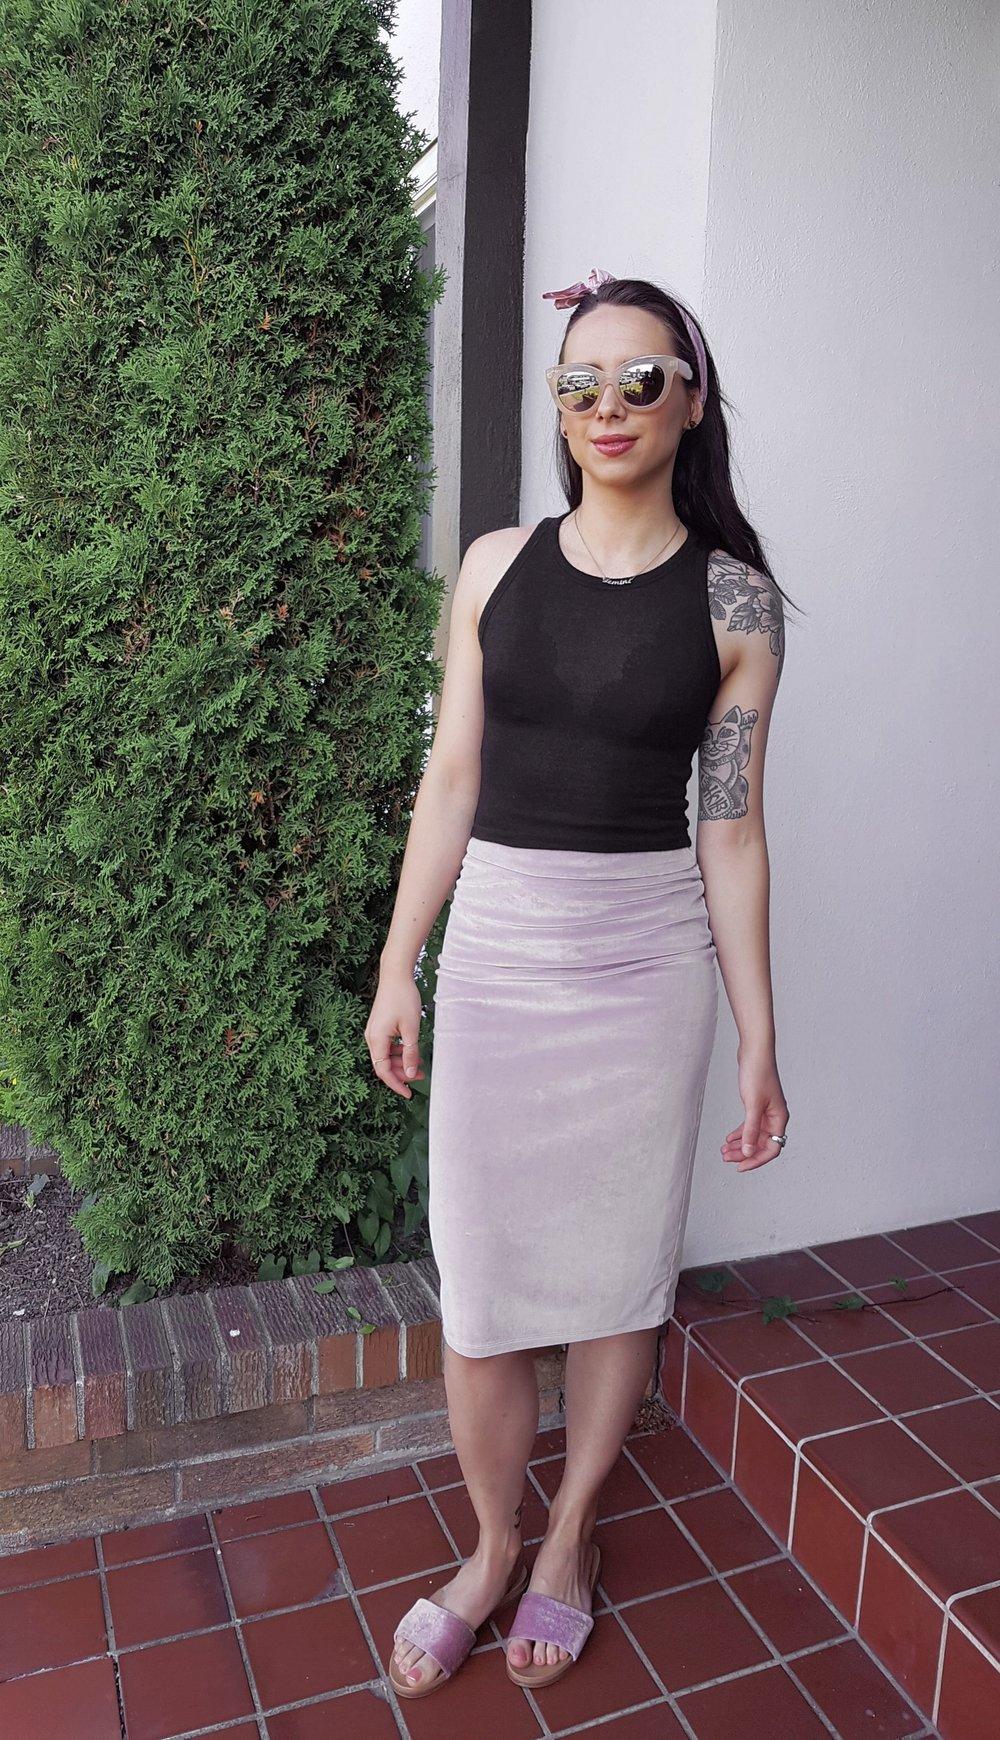 TUESDAY - Aritzia top & skirt, Aldo slides, H&M head scarf, Cheap Monday sunnies